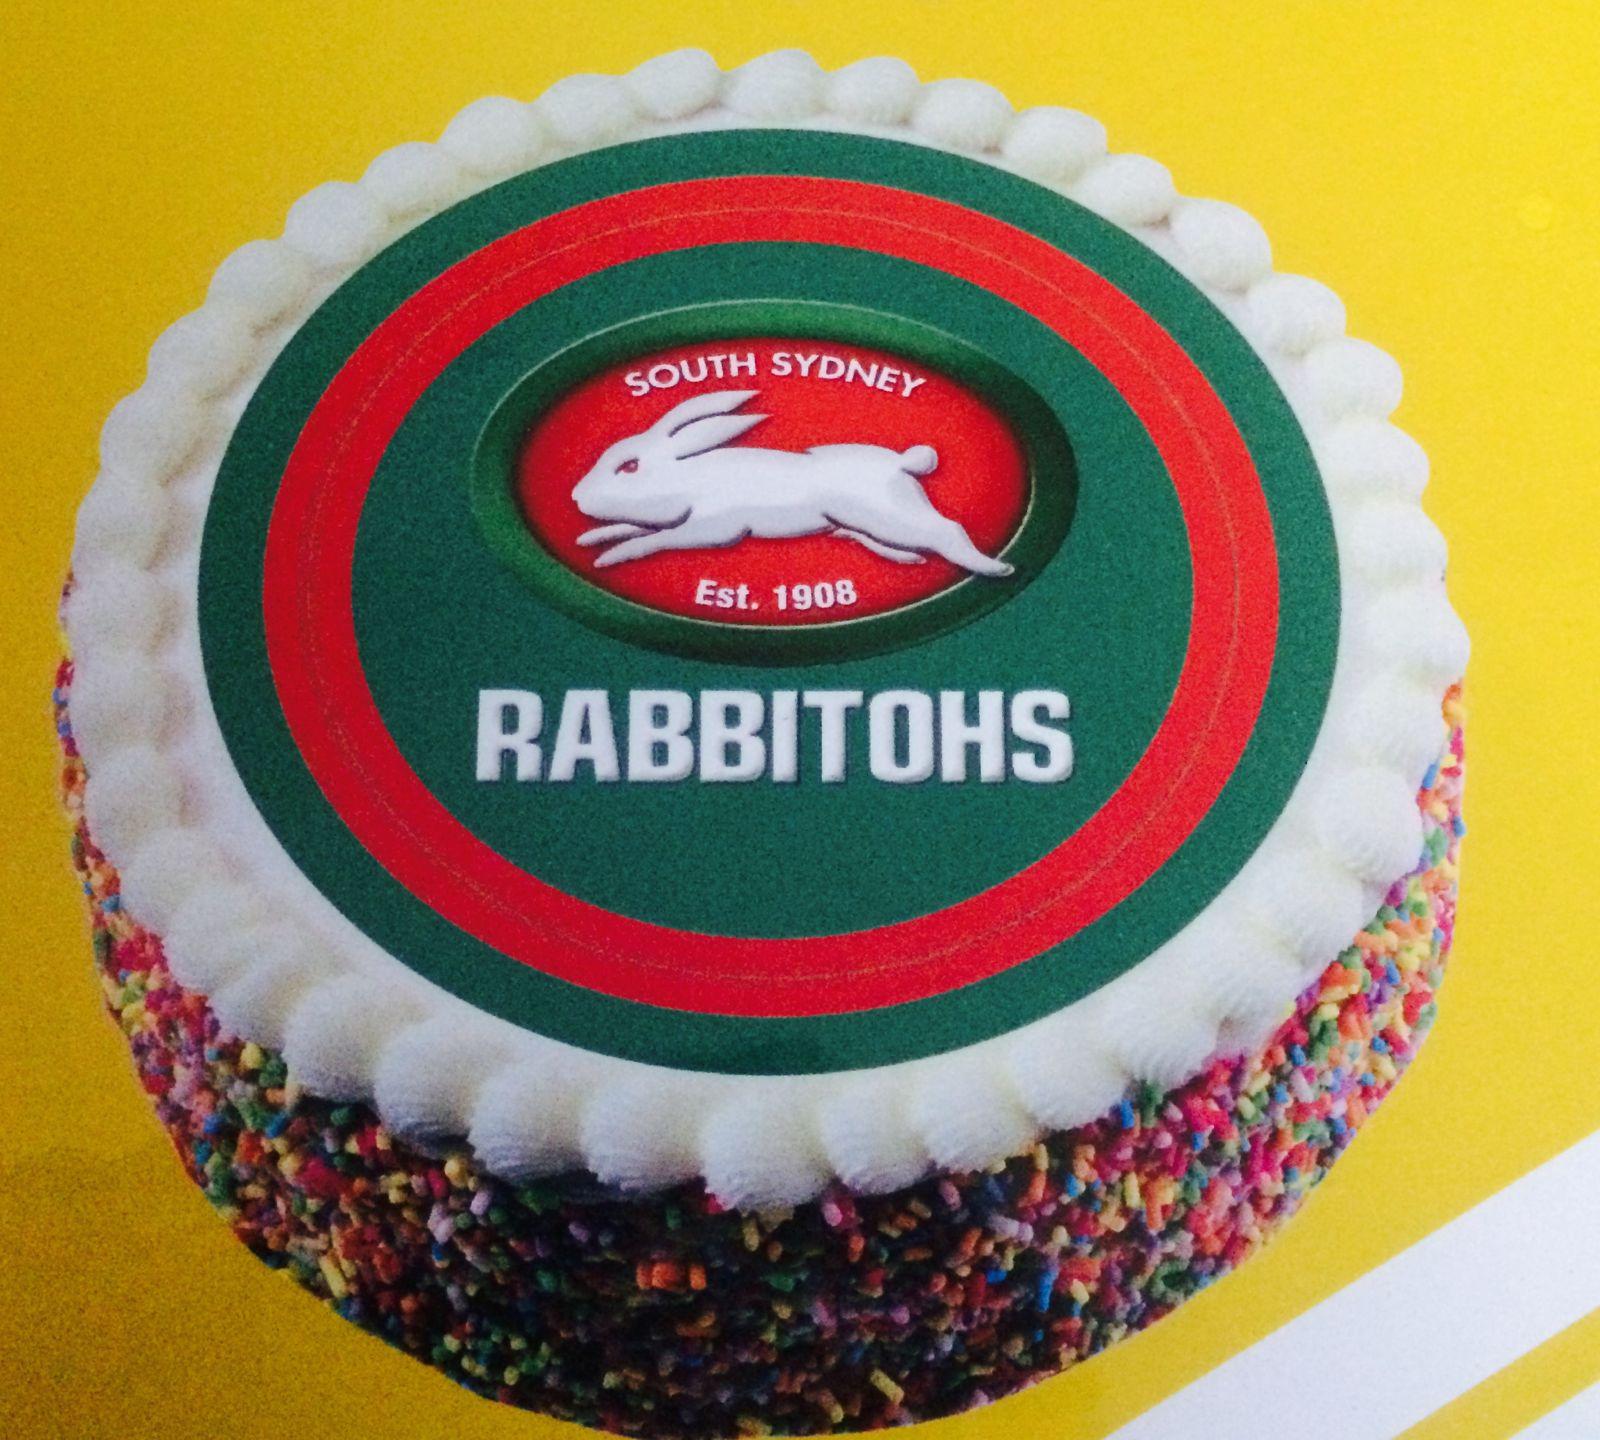 South Sydney Rabbitohs NRL Team Borded Edible Cake Image ...